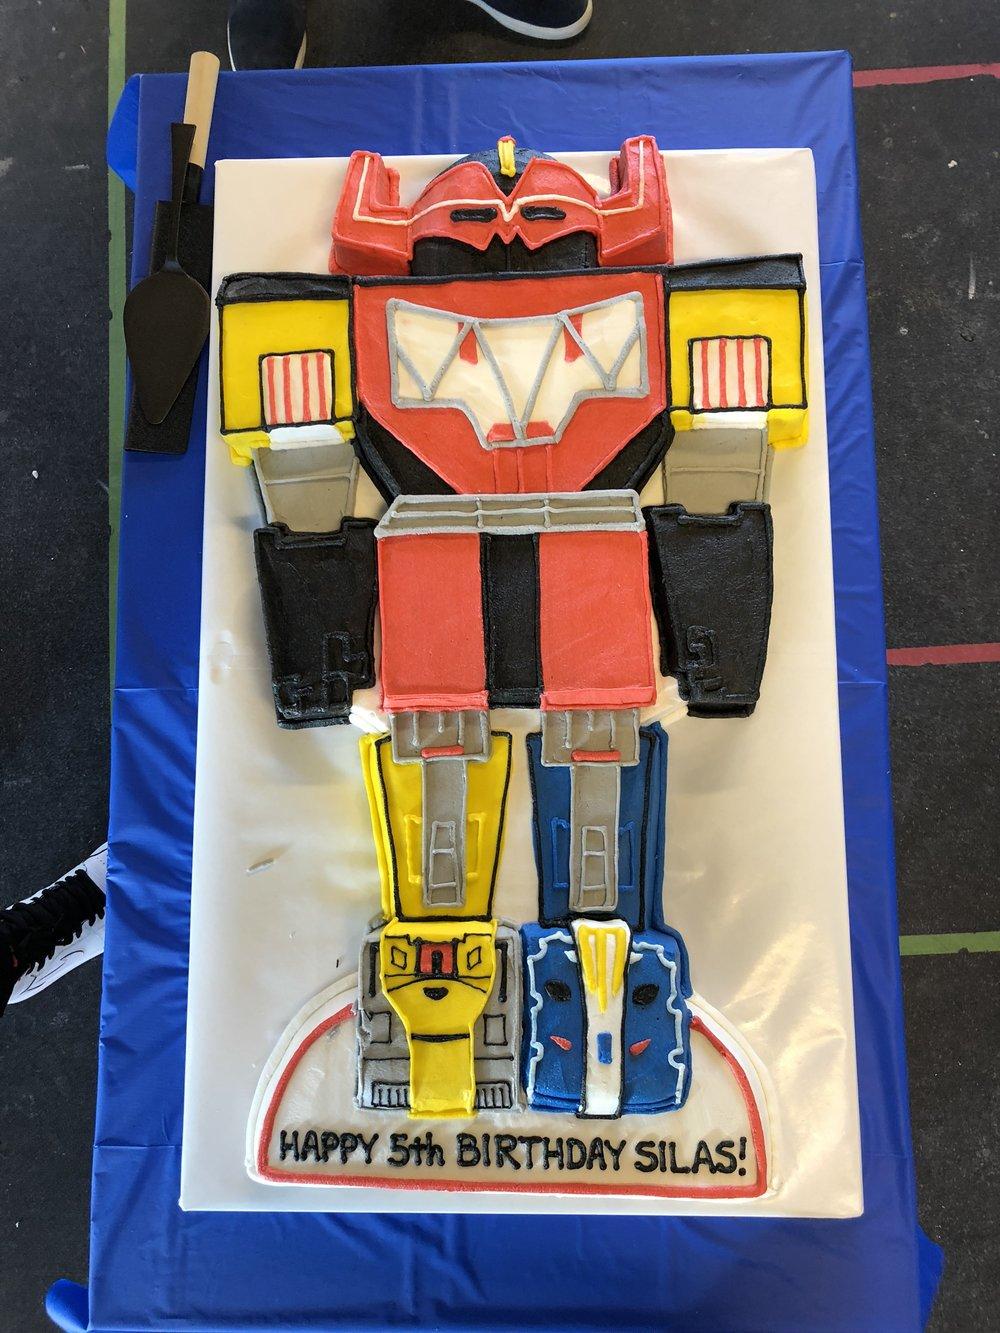 Silas's Transformer birthday cake